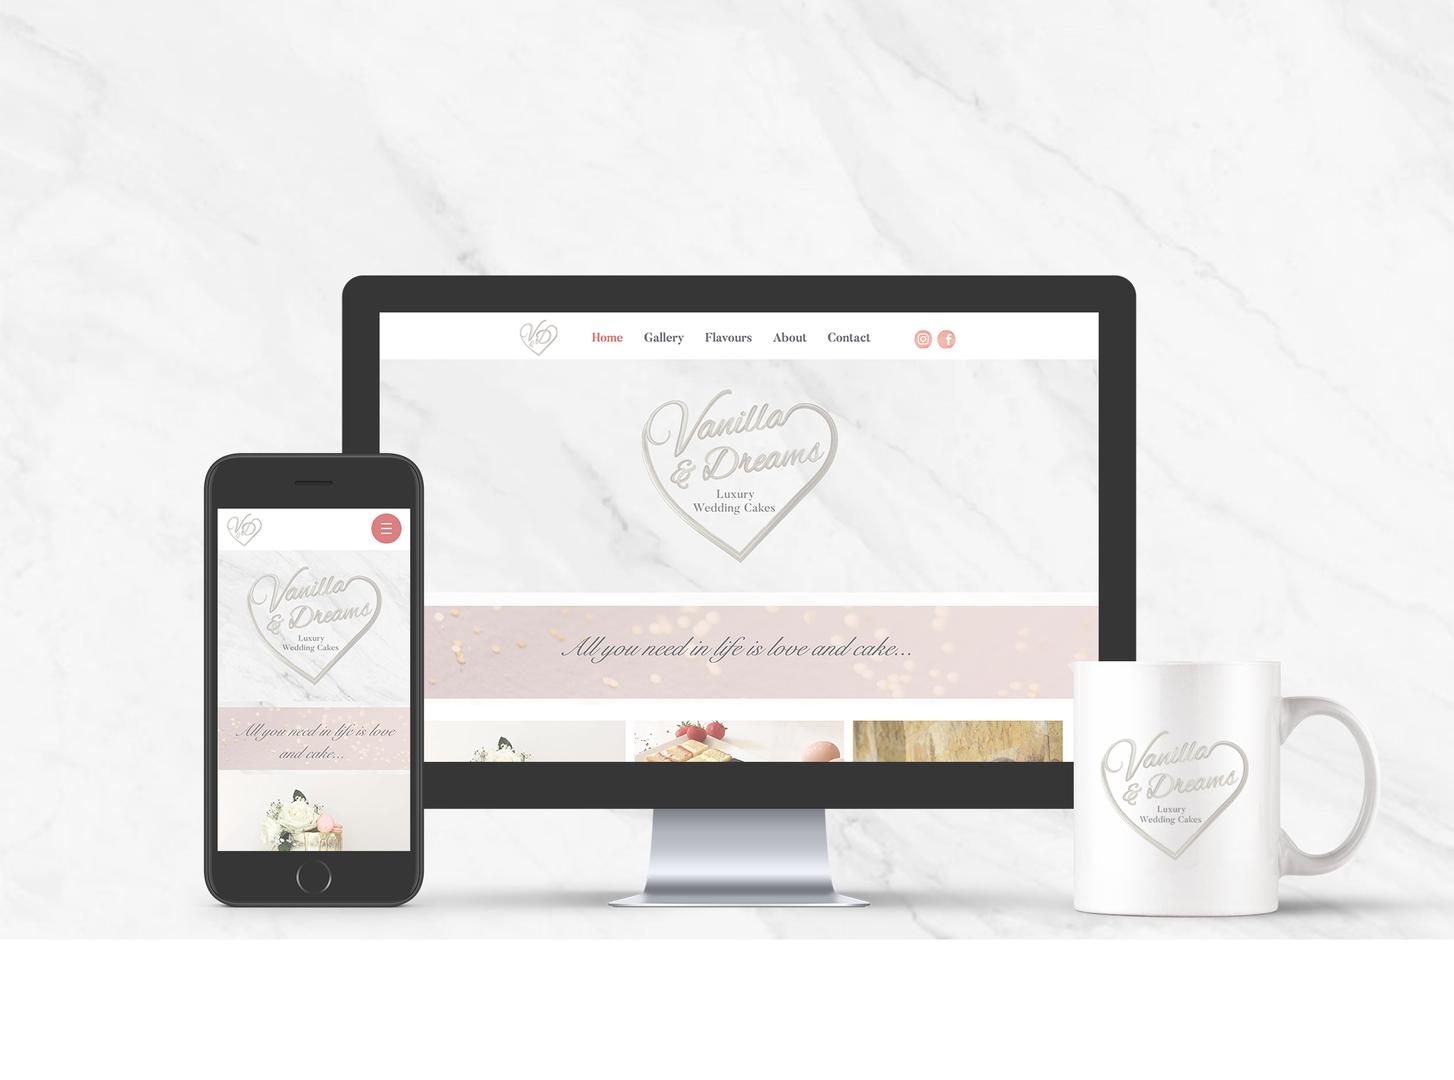 vanilla-and-dreams-mockup-web-design.png